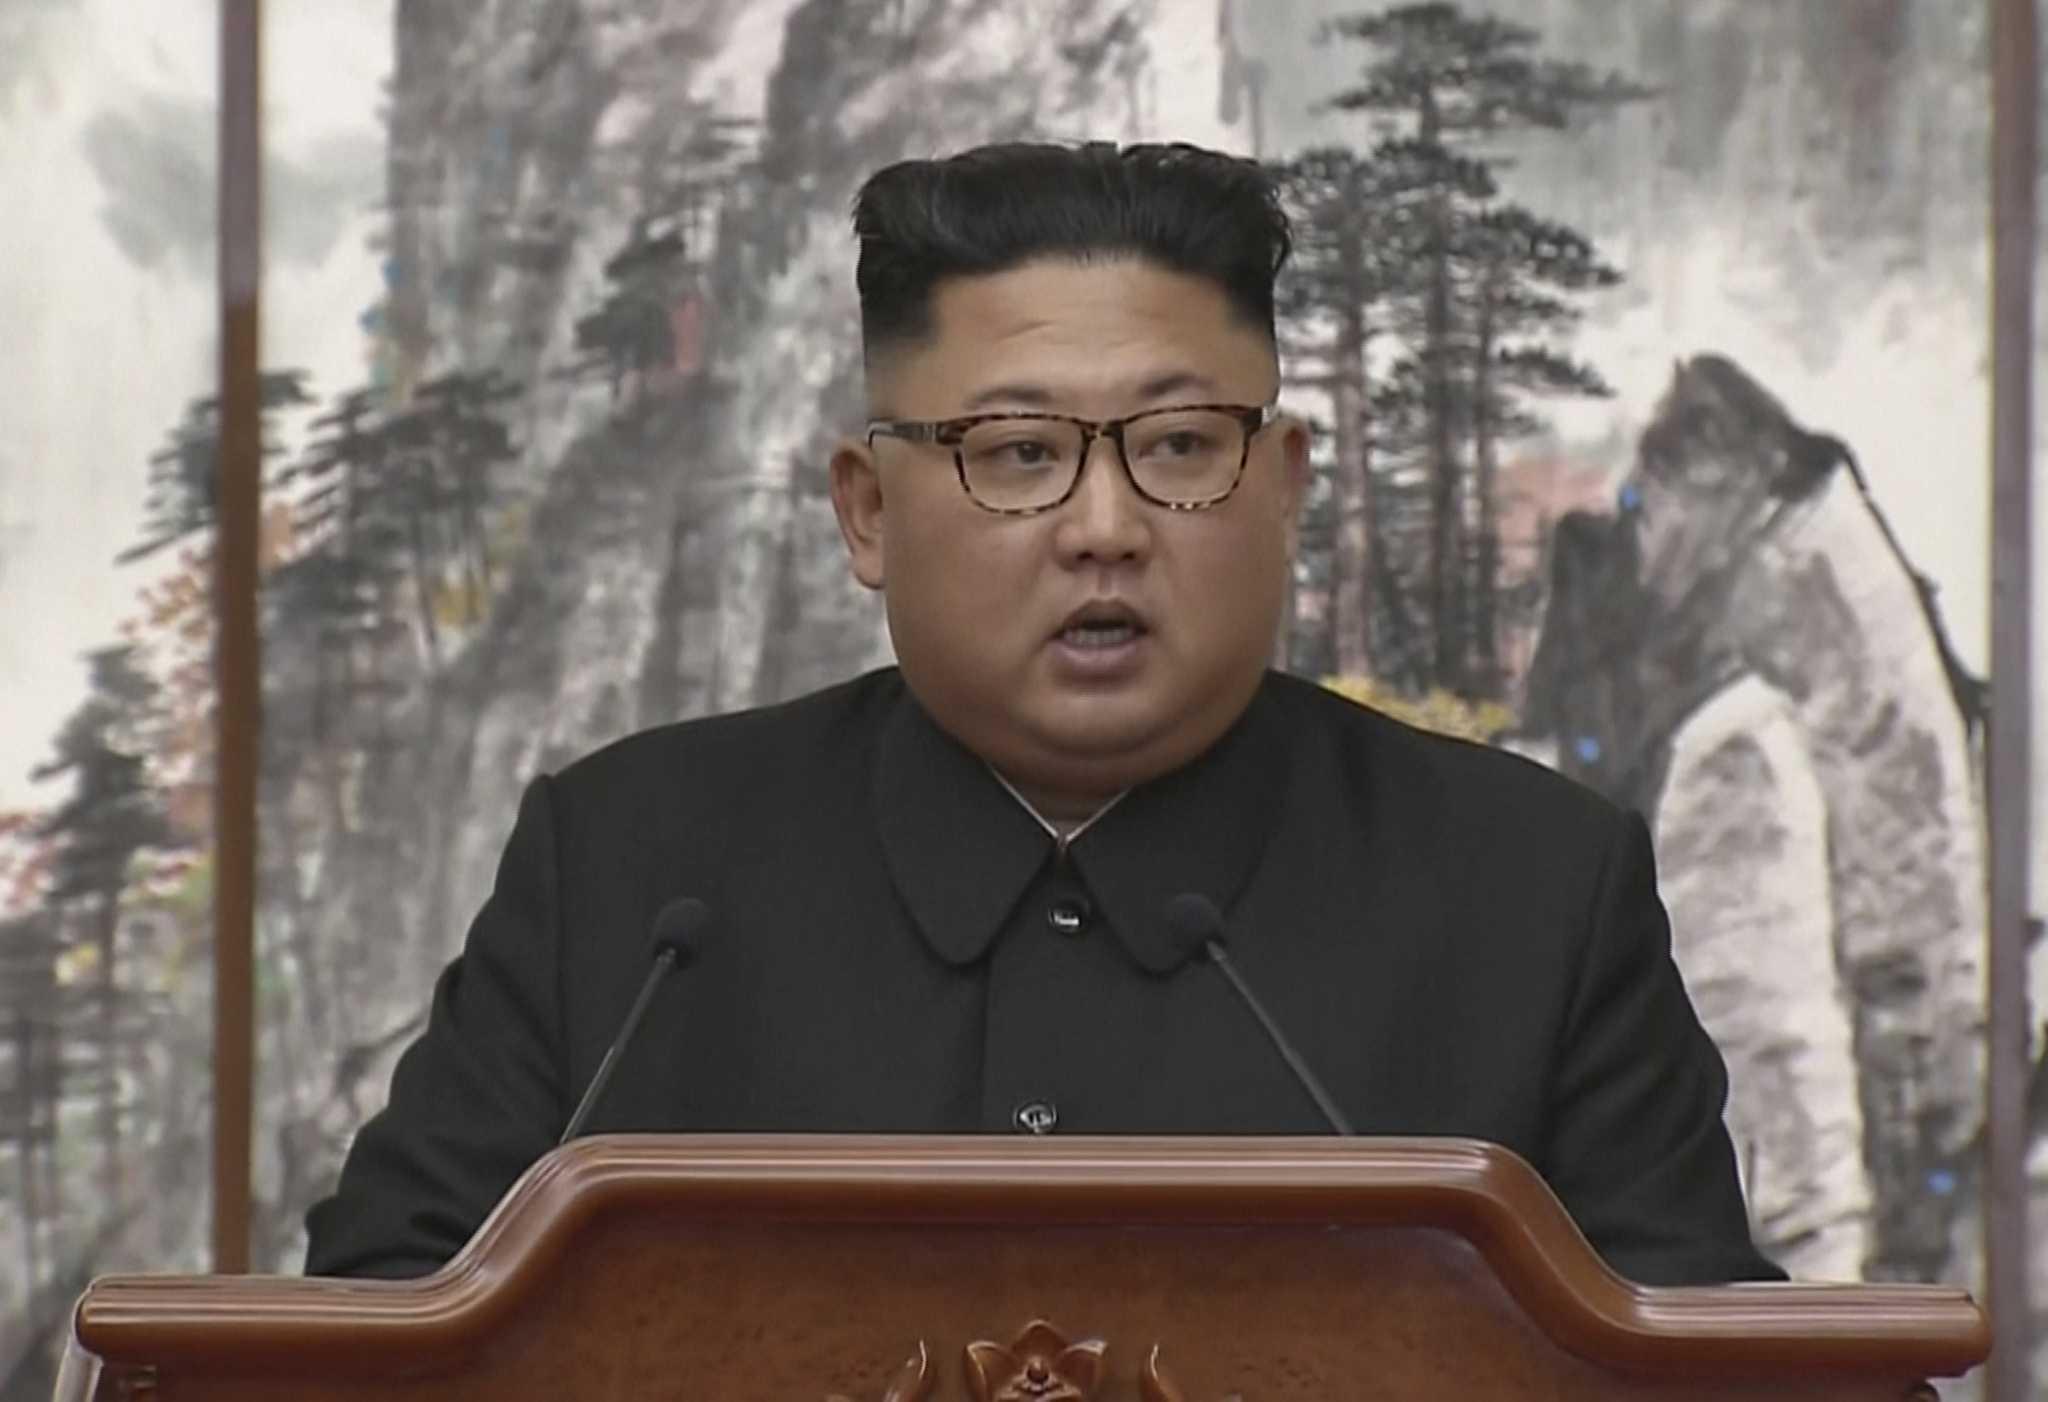 Kim agrees to dismantle main nuke site if US takes steps too https://t.co/cdkV7e0TGE https://t.co/NBrnUWstlt